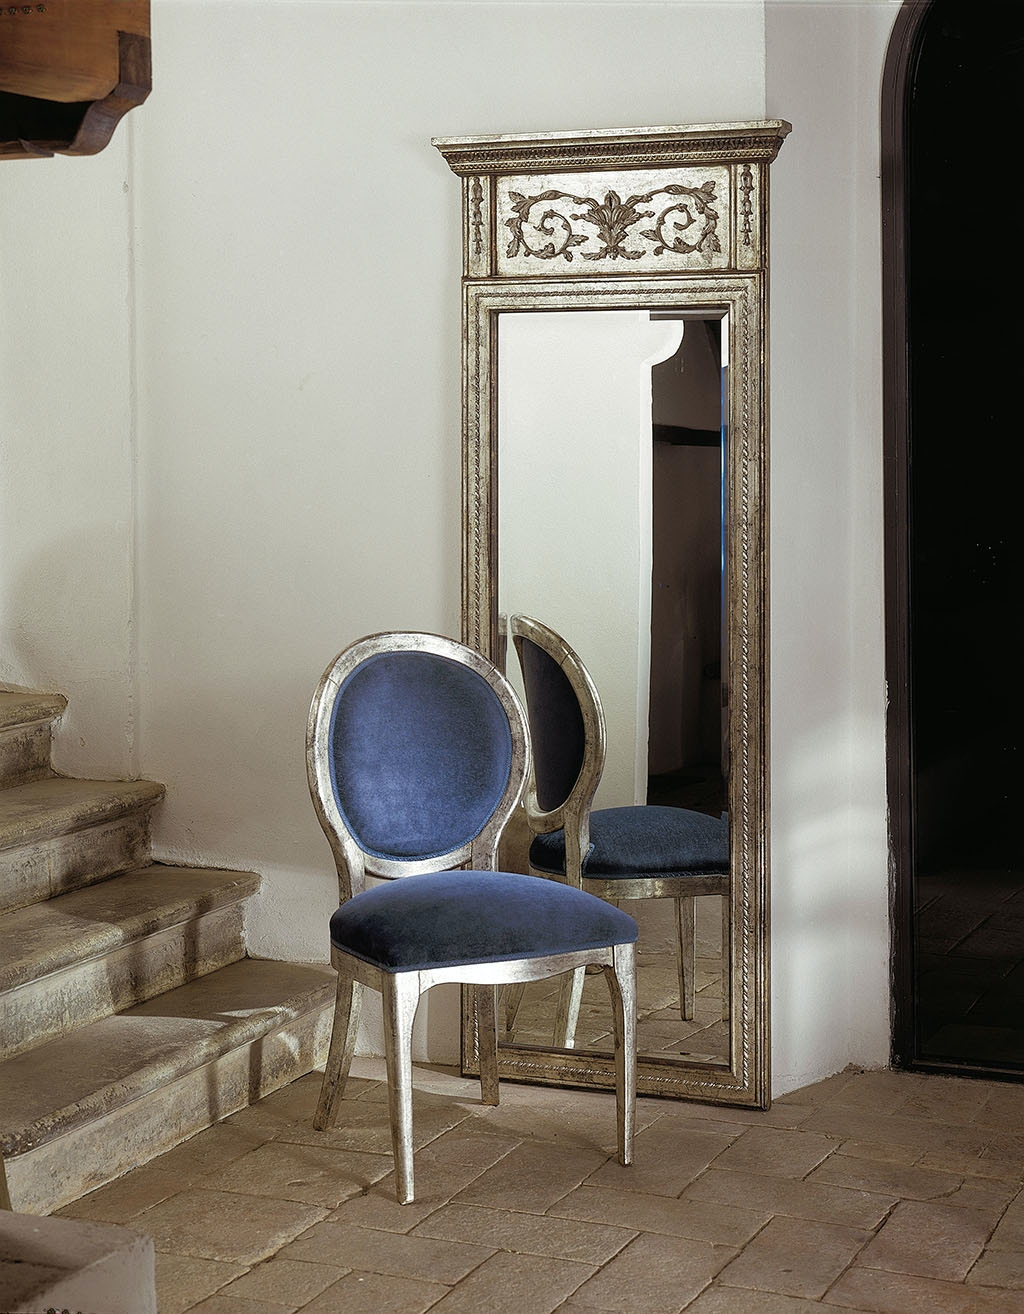 Von Hemert Interiors Italian Imports Mfr: XI64 Mirror #9402B